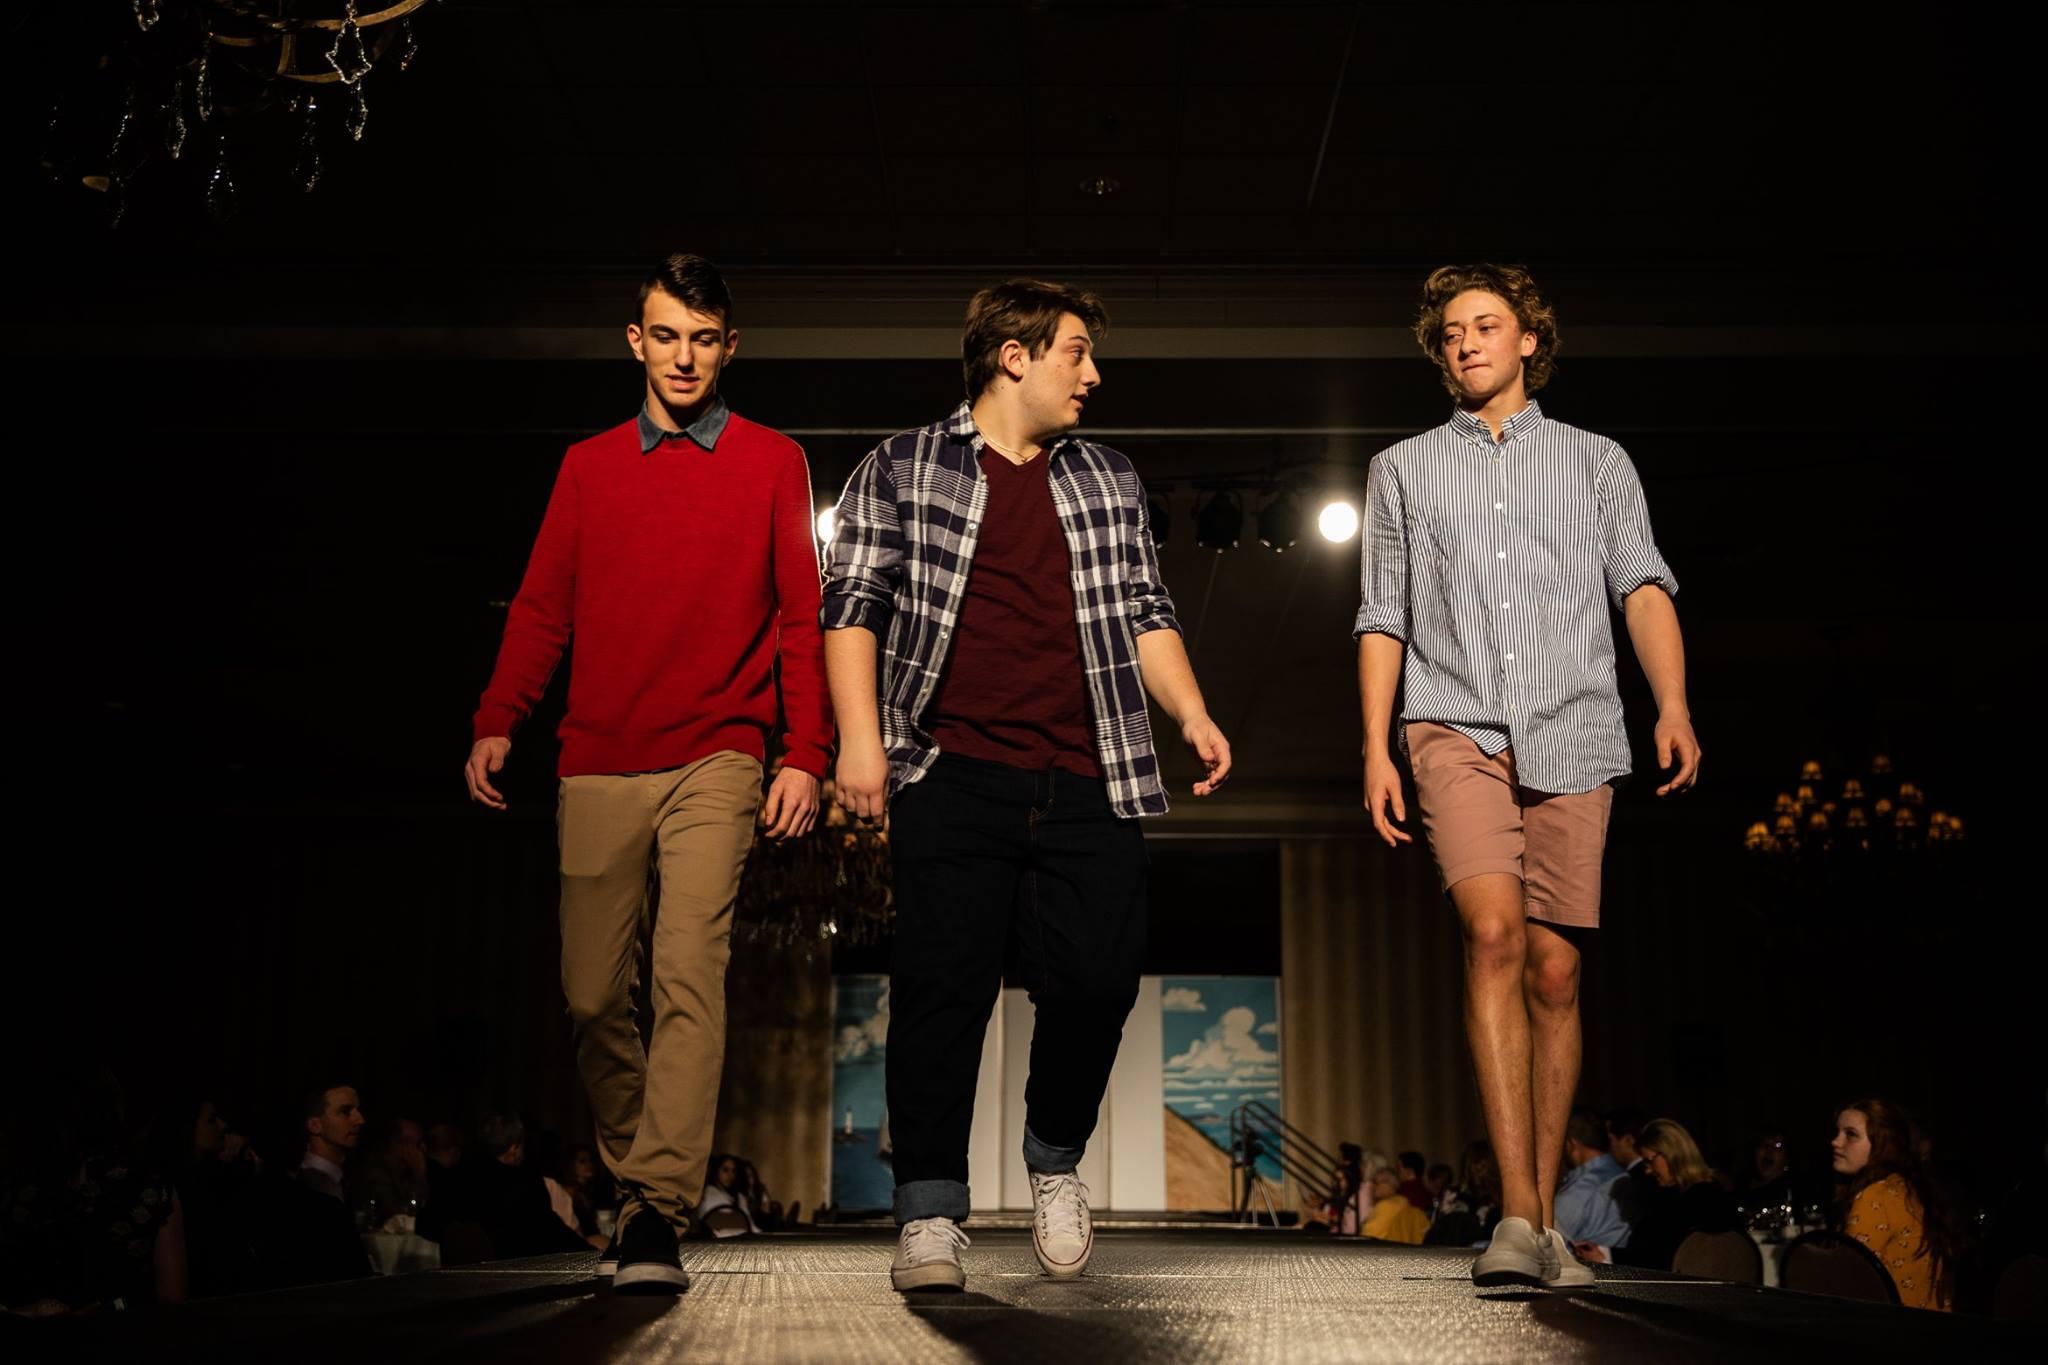 Lutheran_North_High_School_Macomb_Michigan_LHN_Fashion_Show_2019 (16).jpg